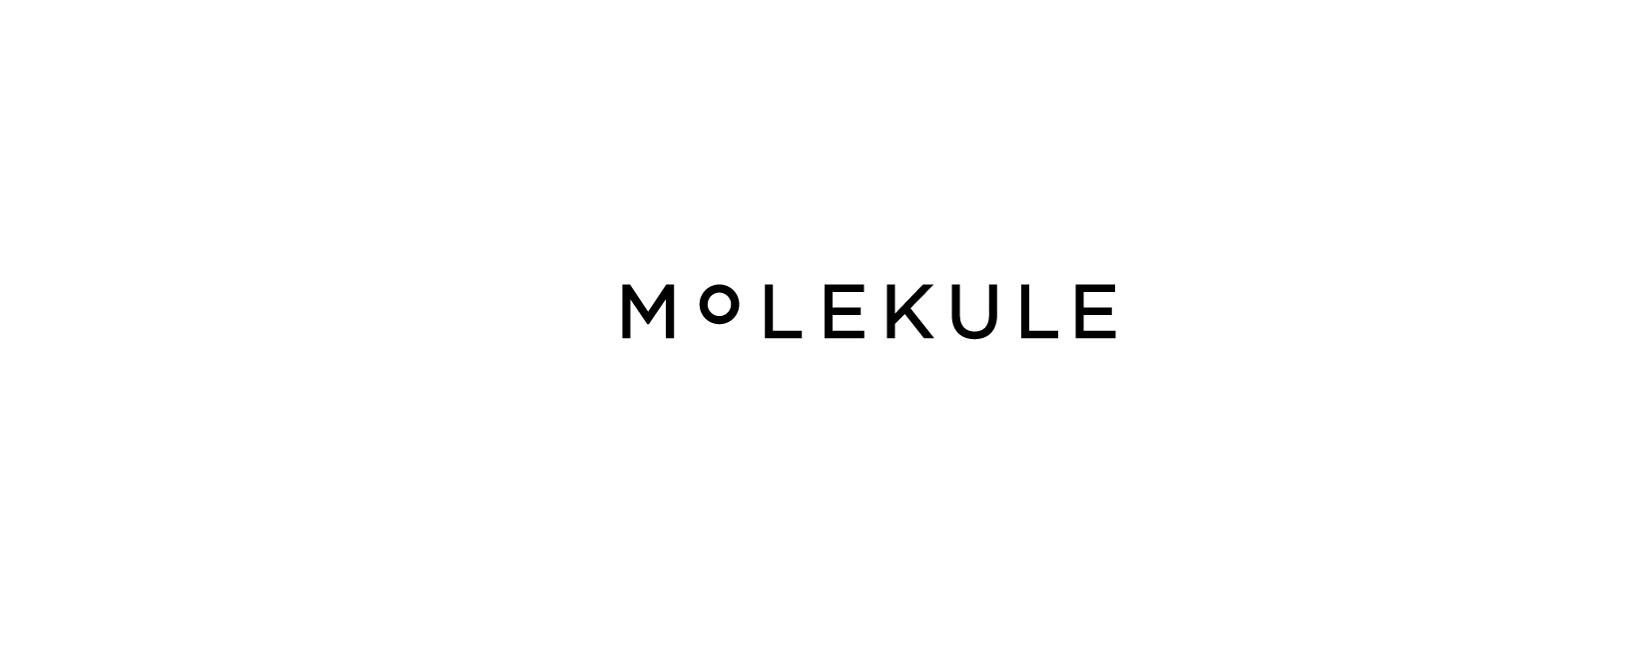 Molekule Discount Code 2021